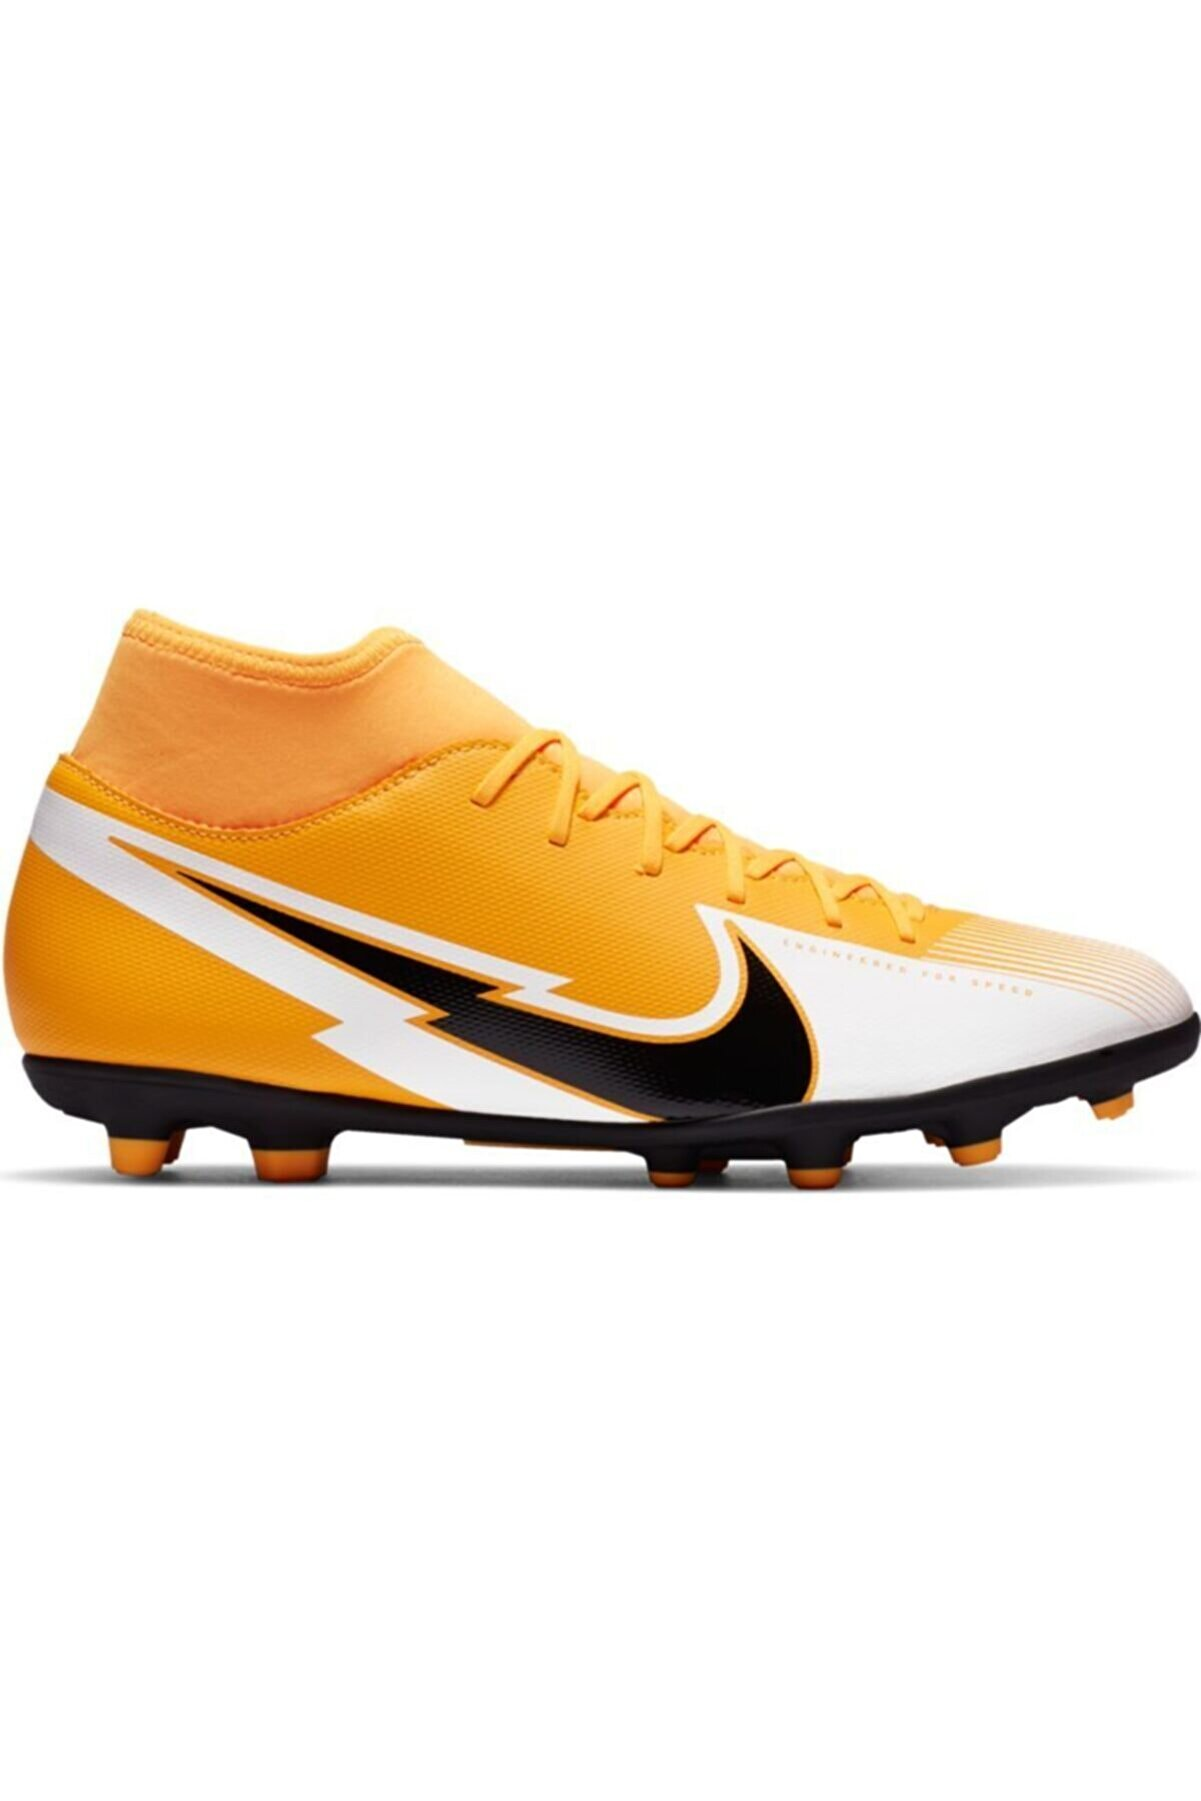 Nike Superfly 7 Club Fg/mg Erkek Krampon At7949-801